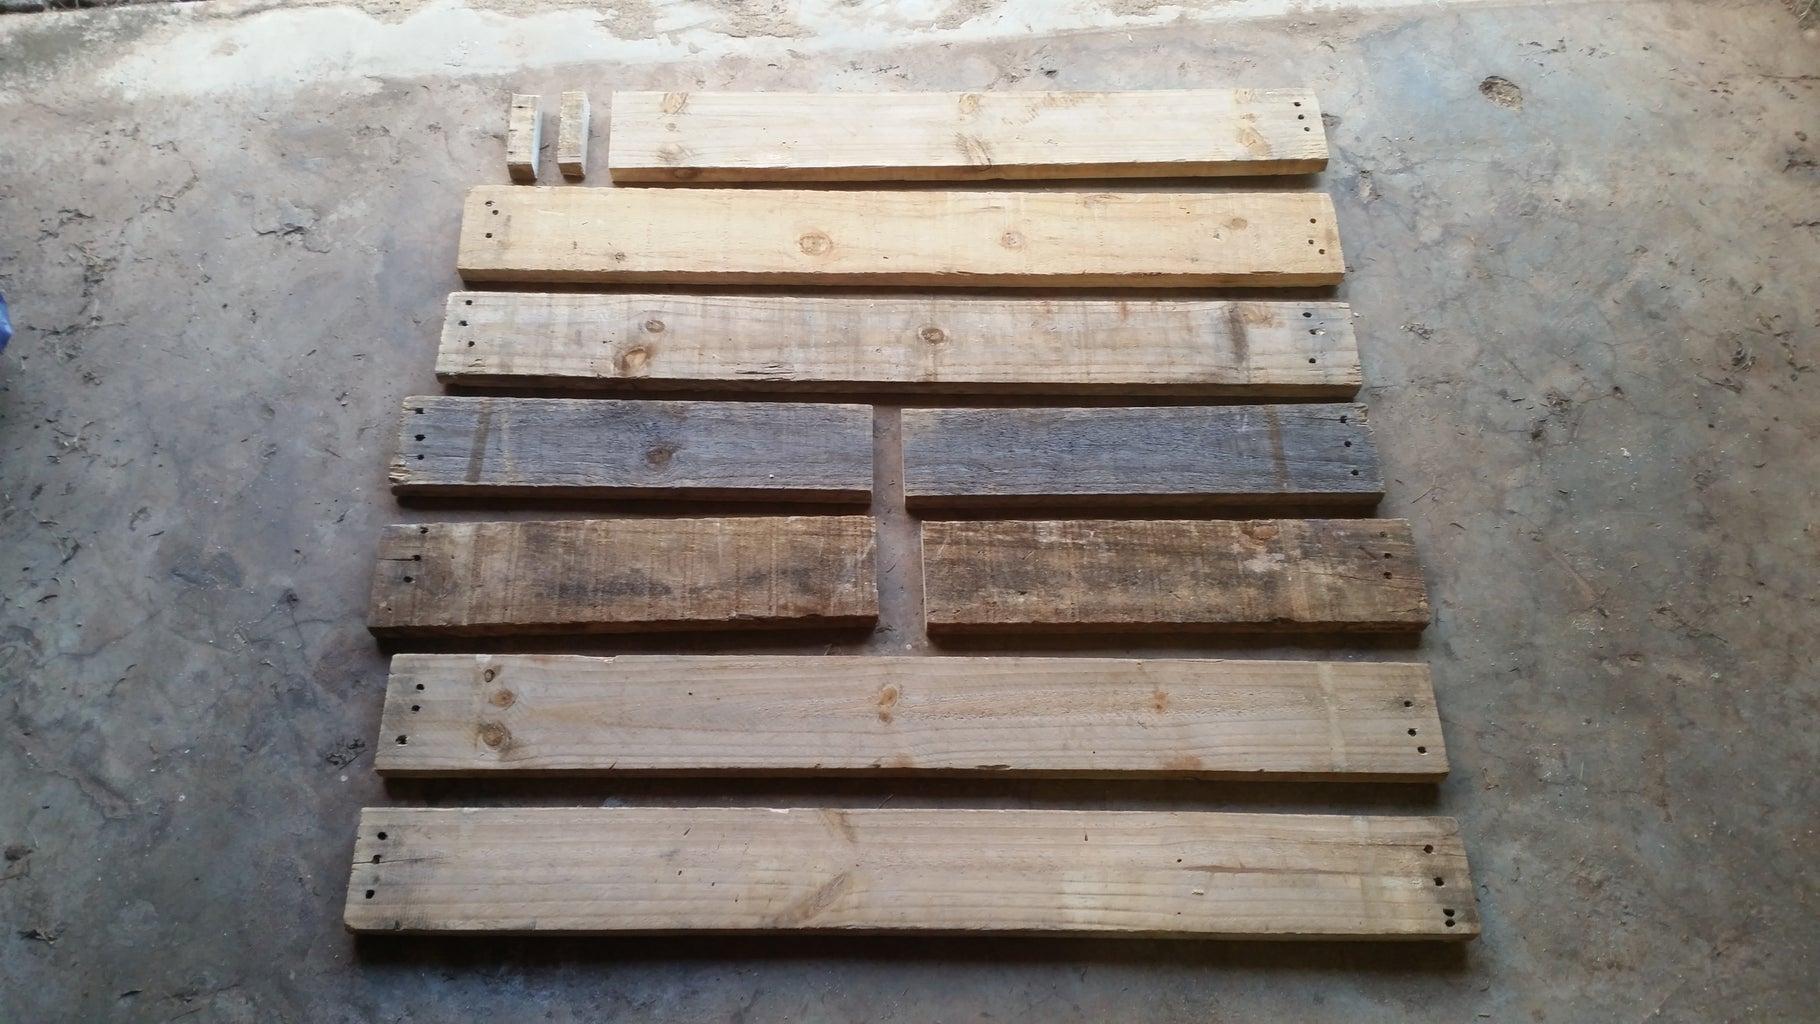 Cutting the Wood: